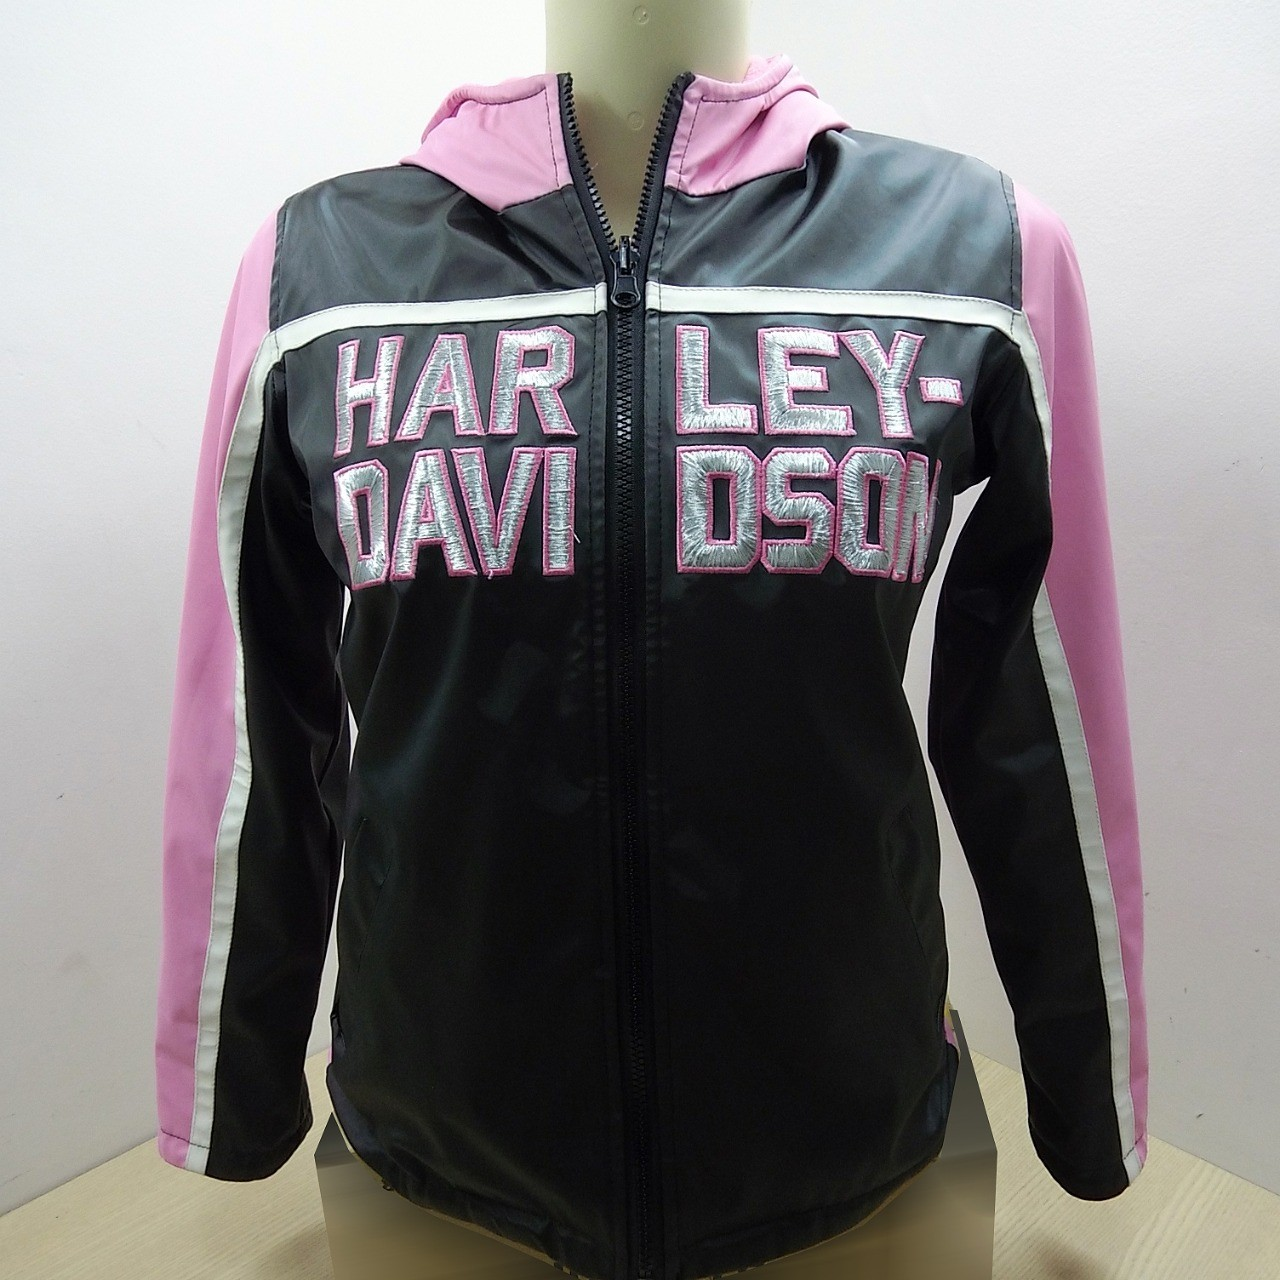 Jaqueta Dupla Face - Nylon / Fleece - Harley-Davidson Kids10/12 - Rosa/Preto/Branco - 042/19700